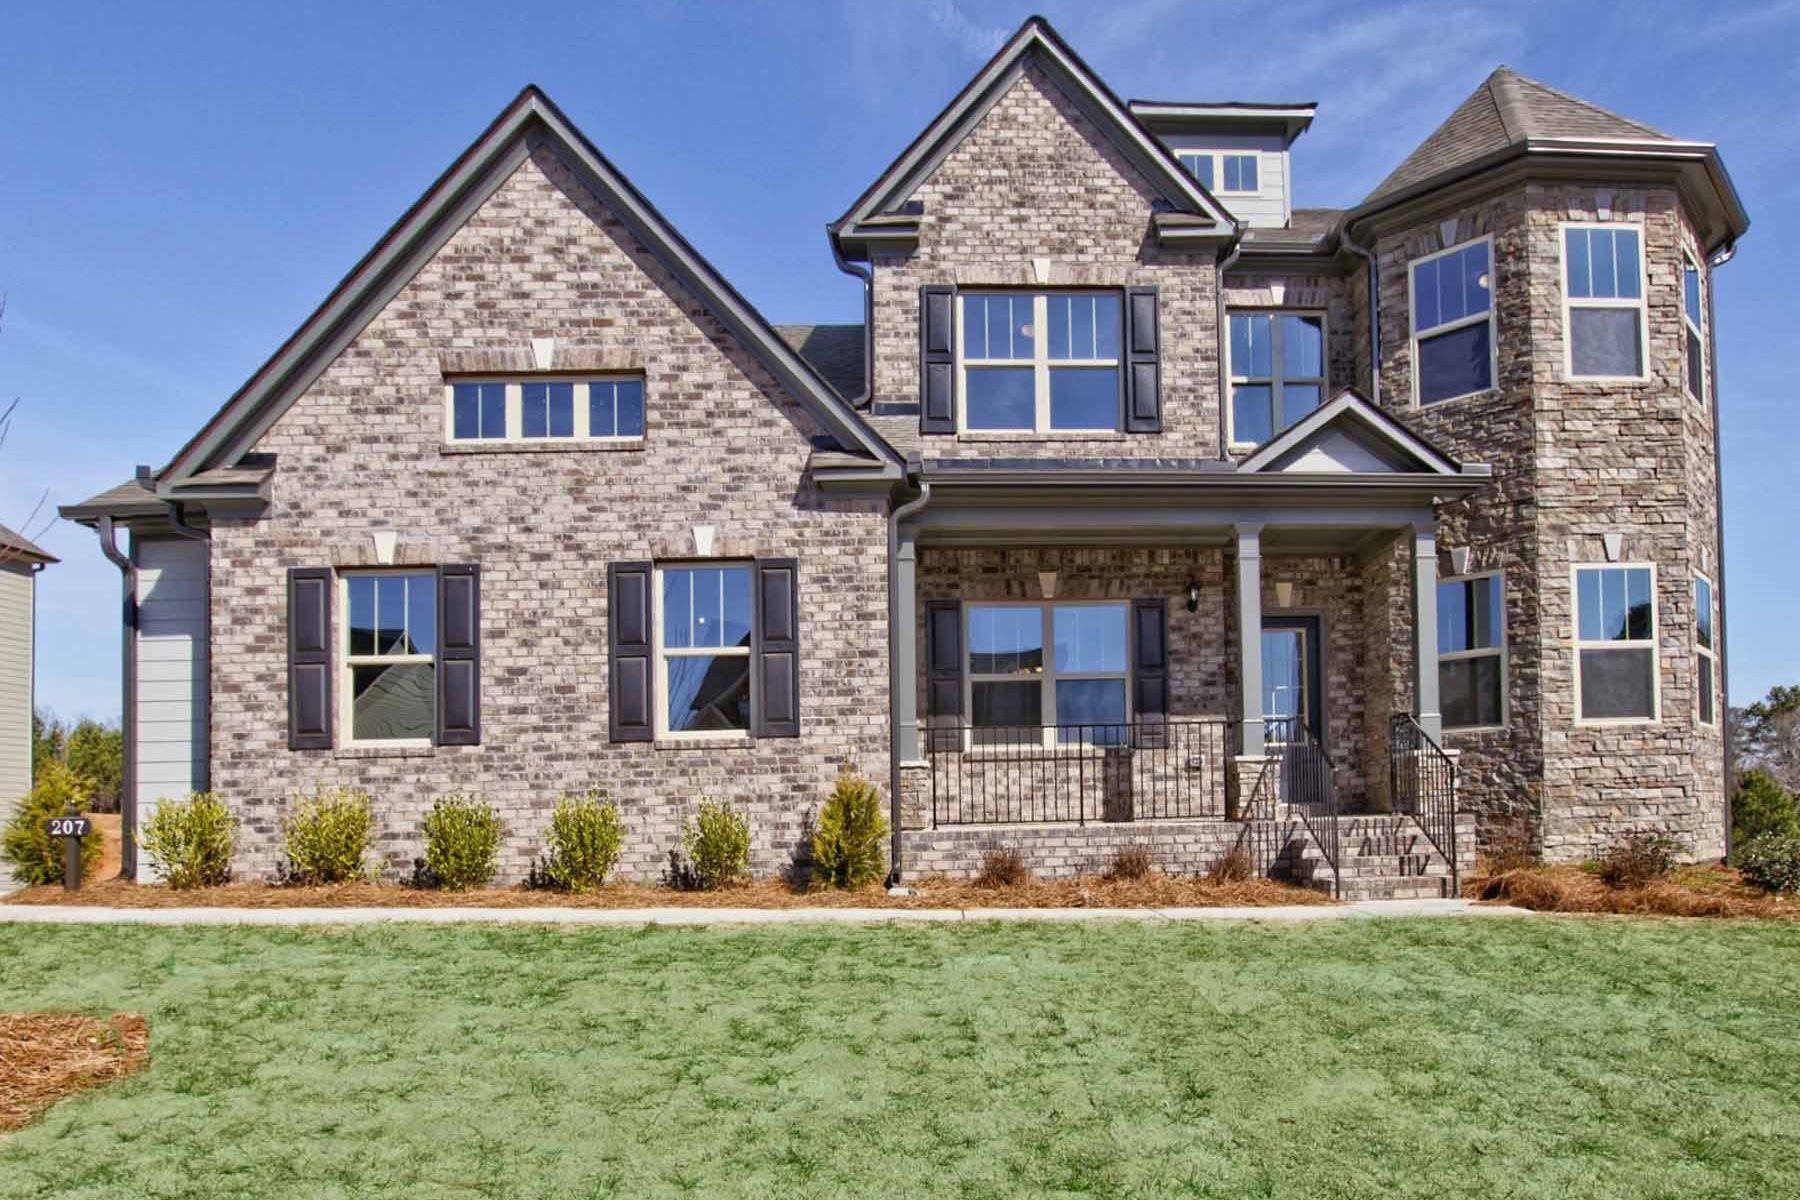 獨棟家庭住宅 為 出售 在 100% Energy Star Certified New Construction 207 Wilde Oak Court Canton, 喬治亞州, 30115 美國